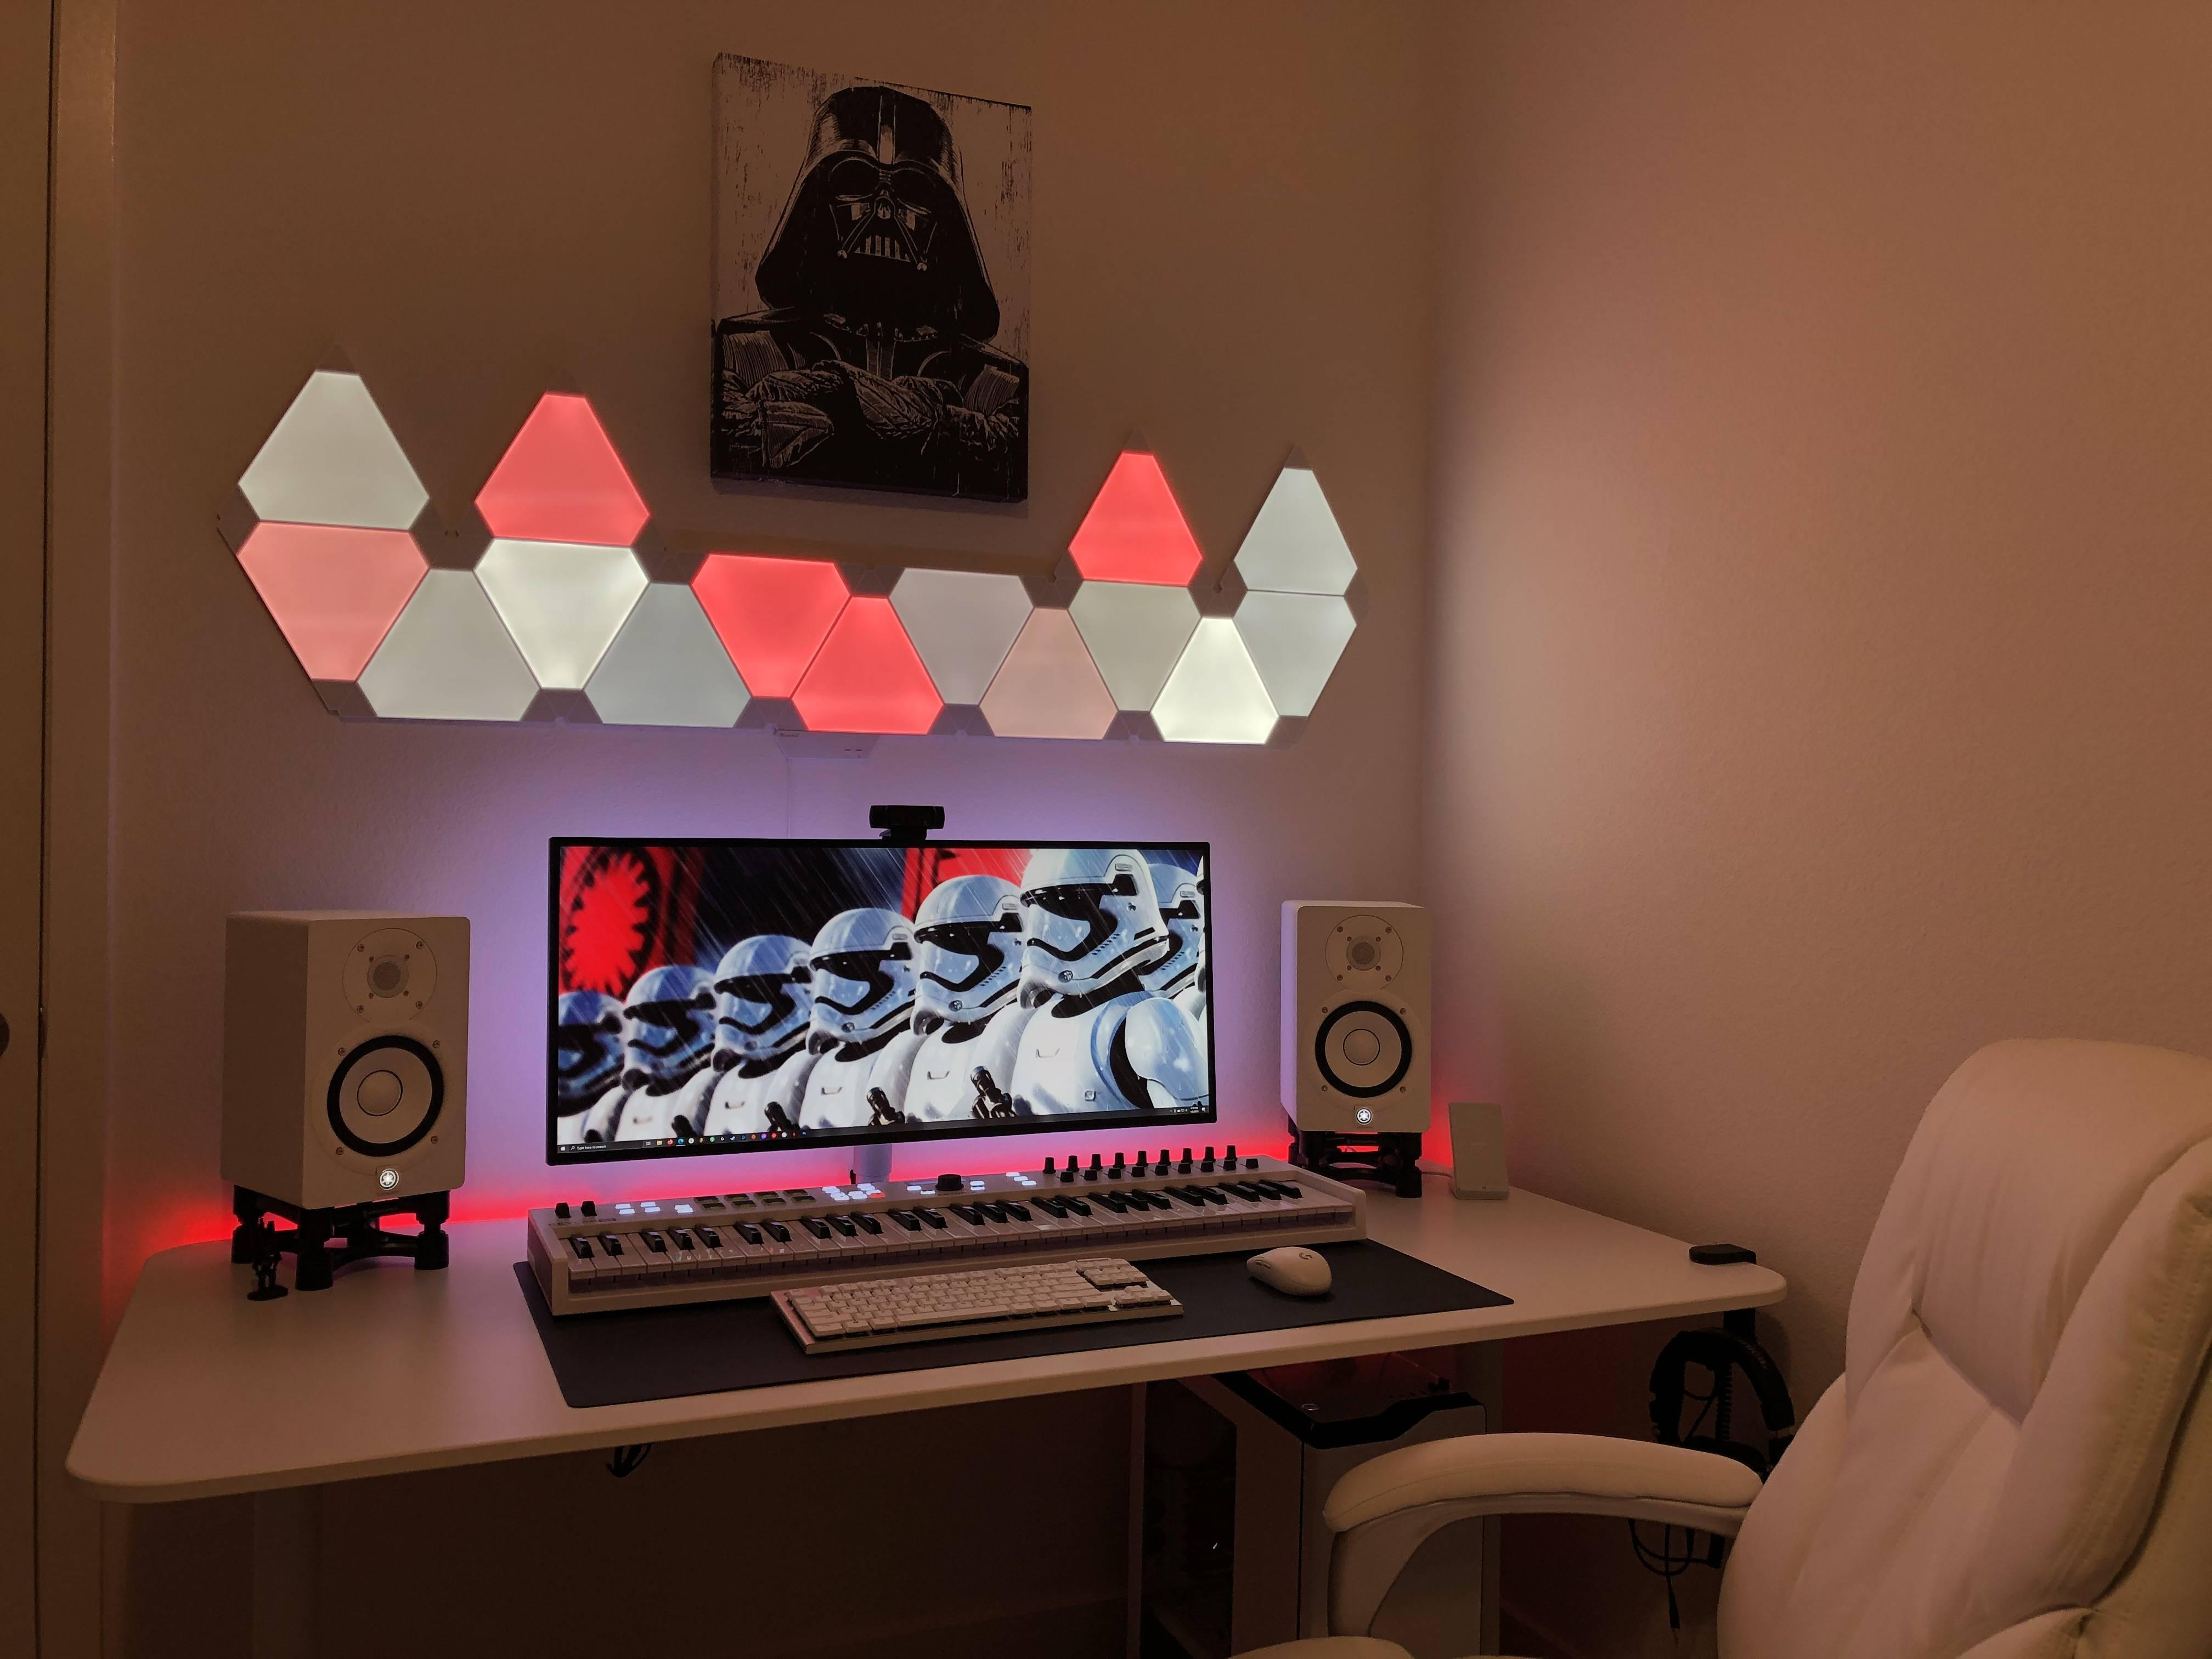 roncruz's Setup - Gaming/Productivity Setup | Scooget